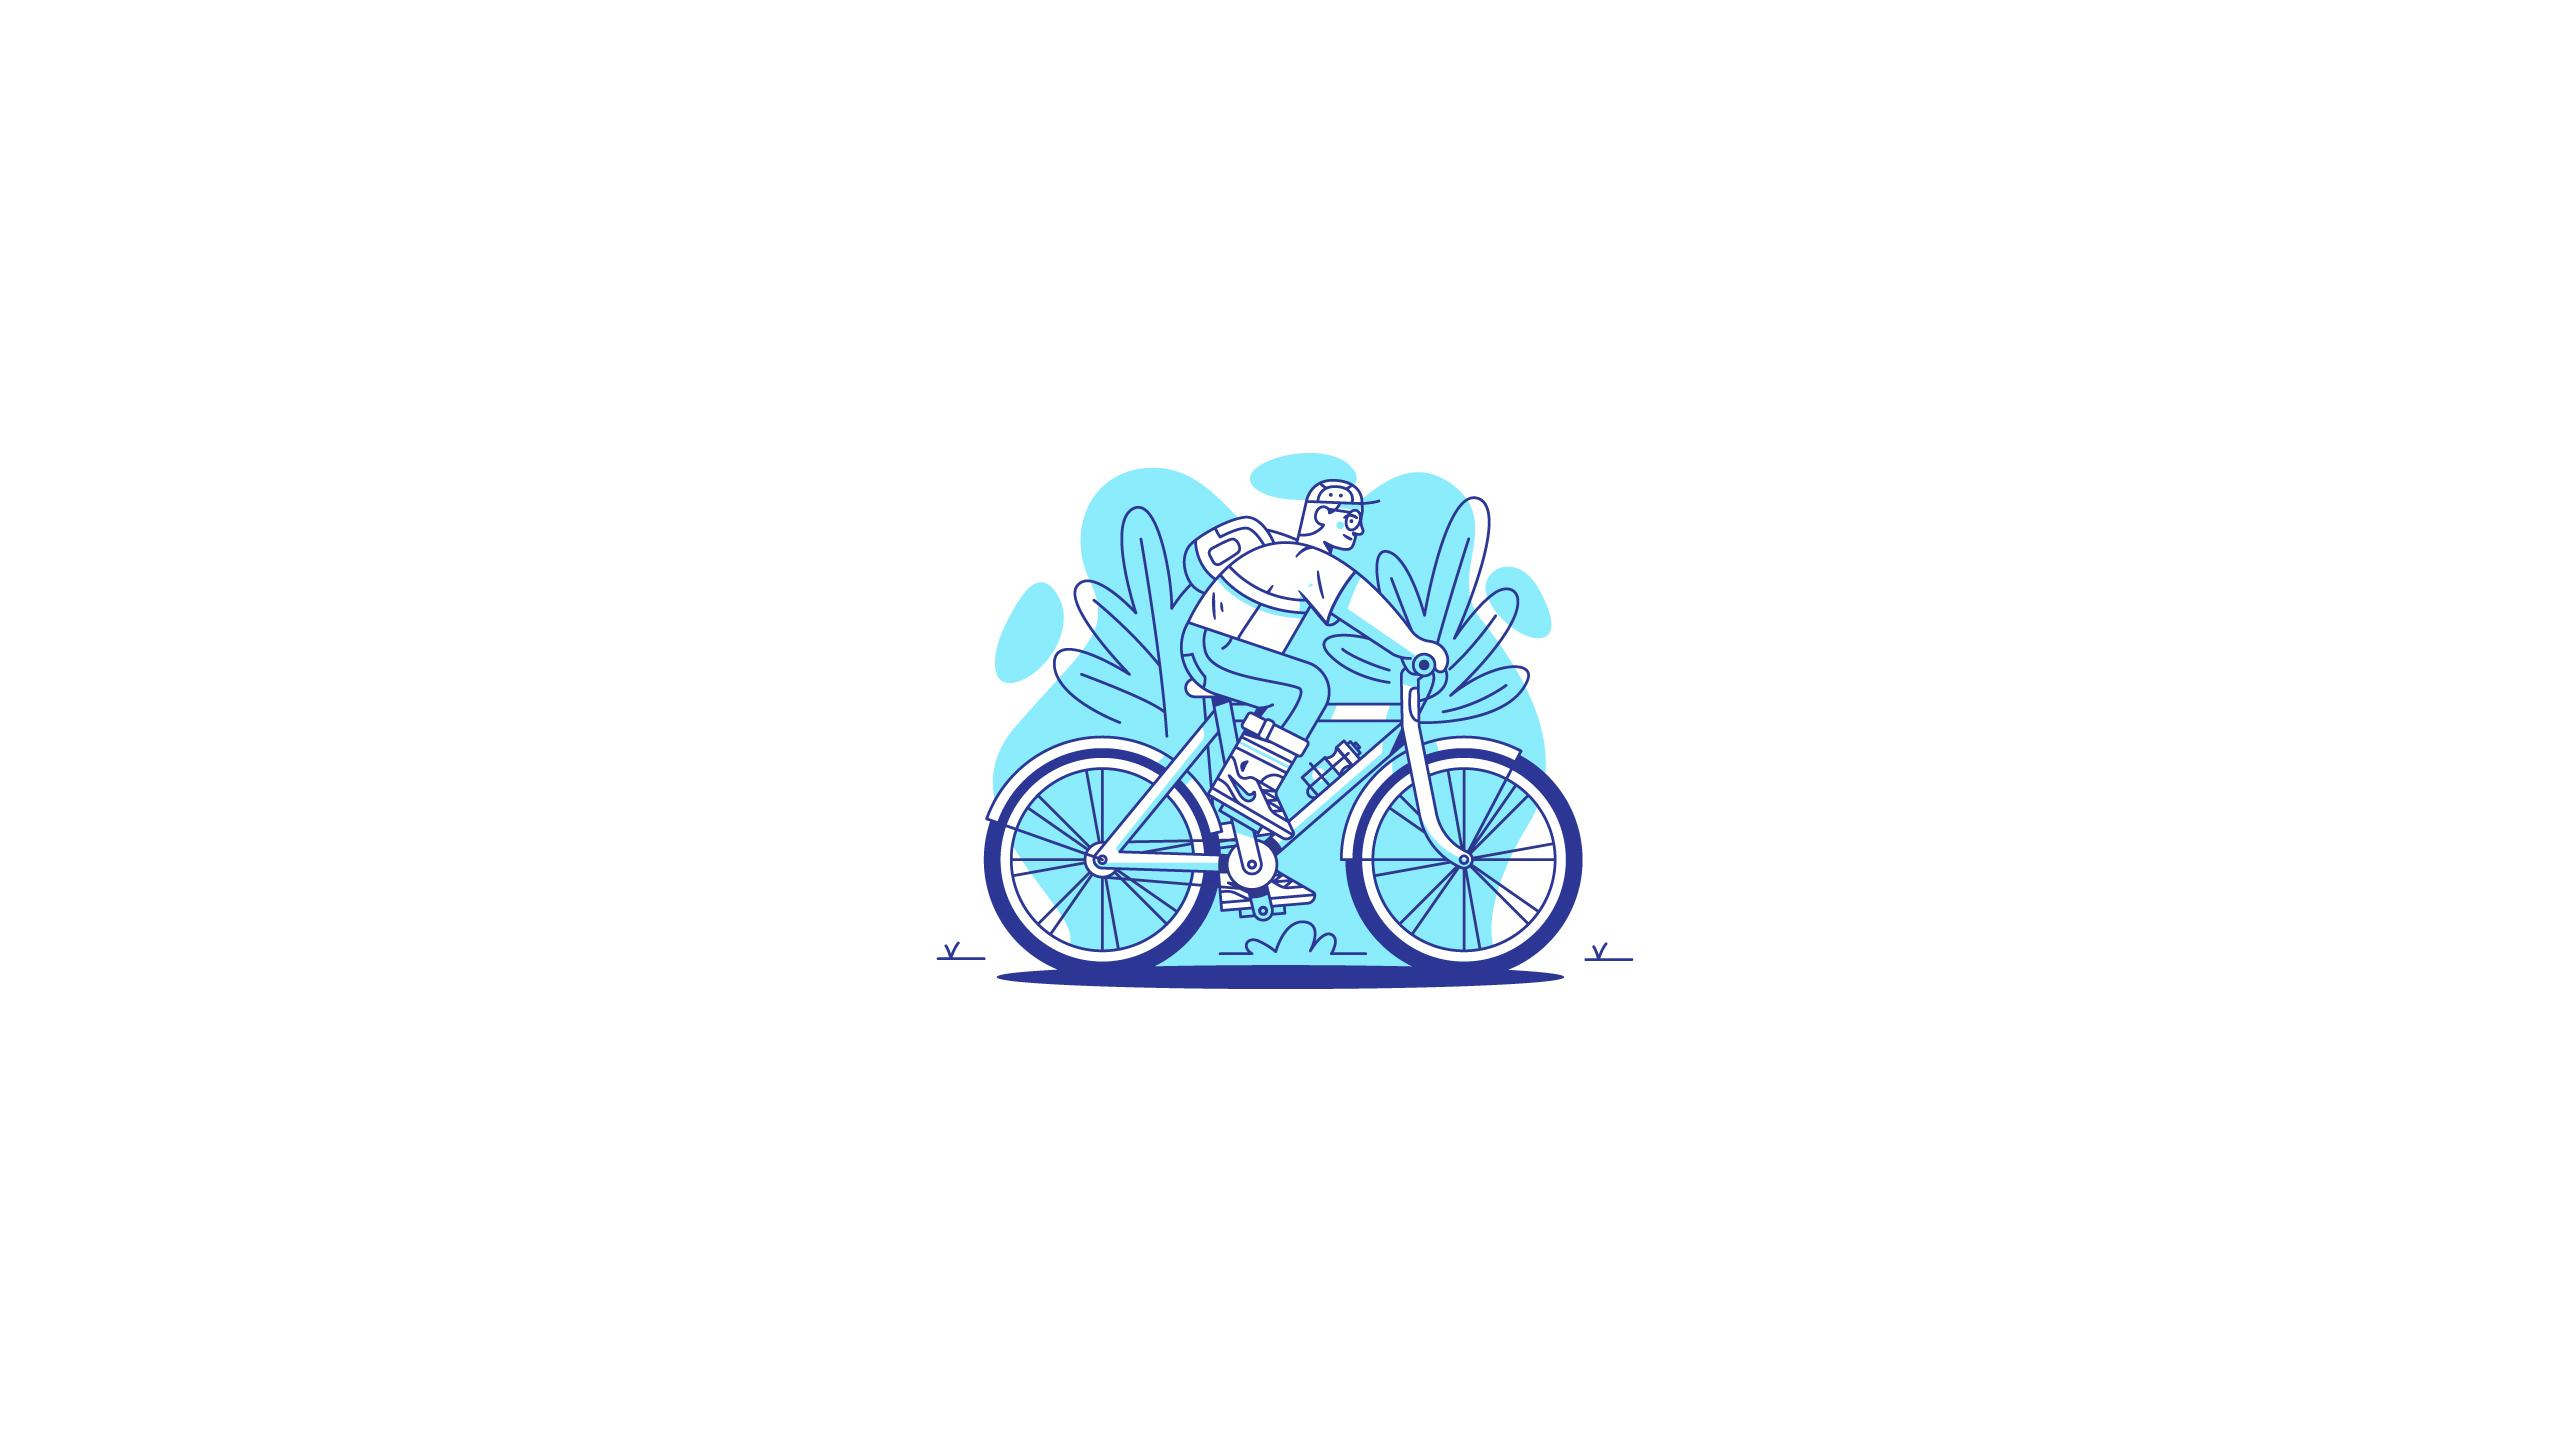 Graphic Design Illustration Bicycle 2560x1440